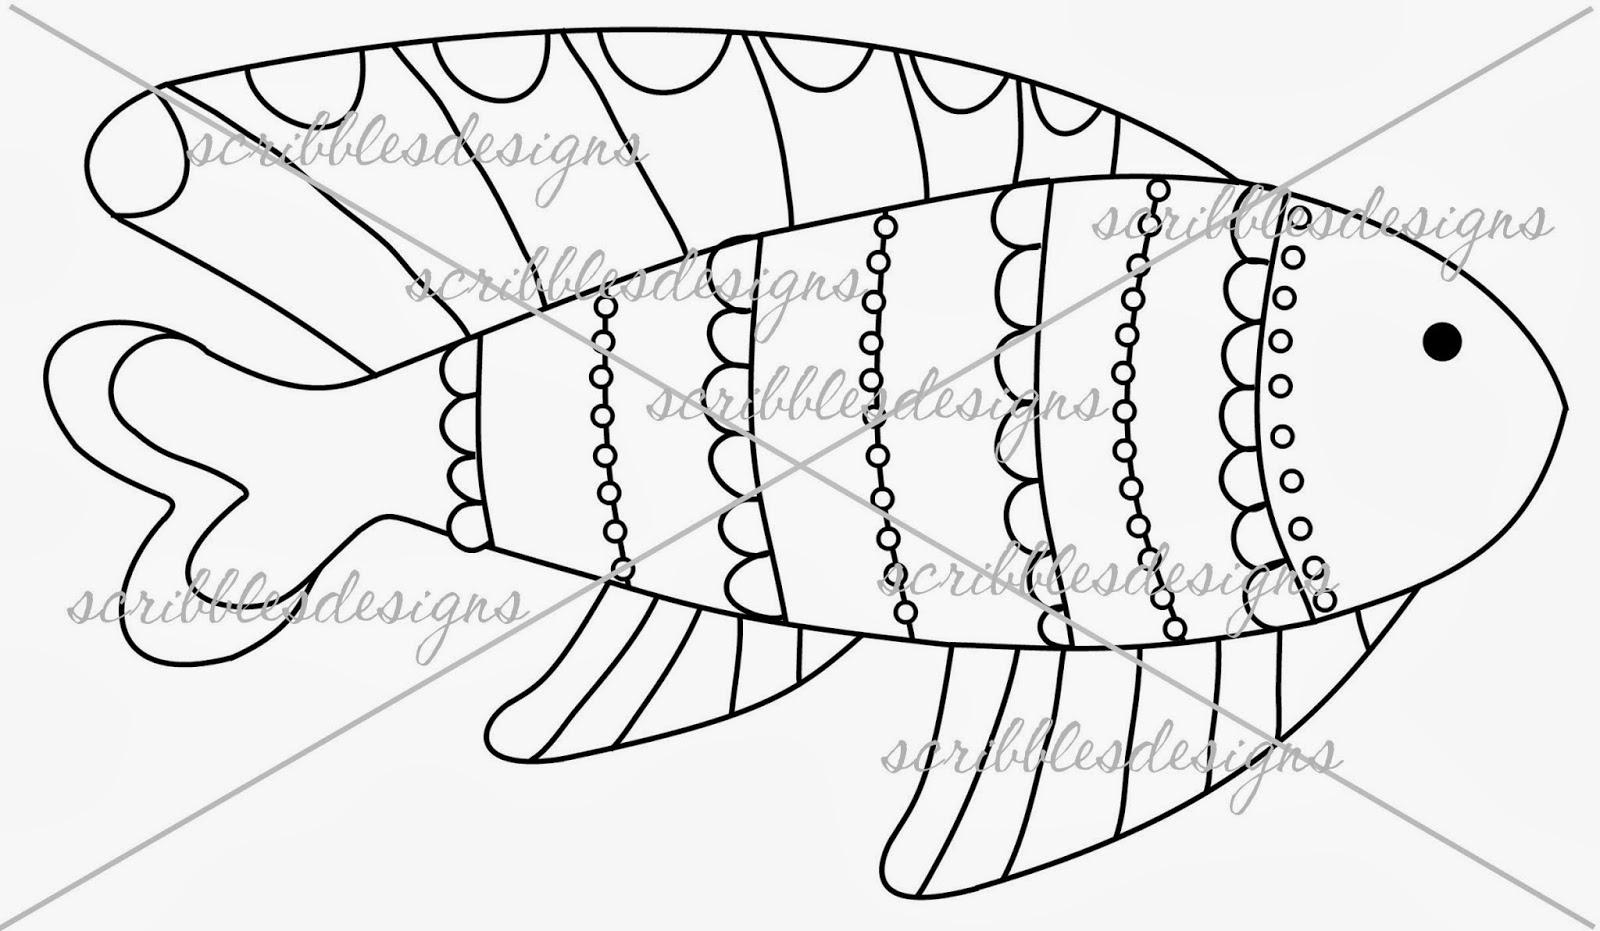 http://buyscribblesdesigns.blogspot.ca/2013/08/317-tropical-fish-6-200.html